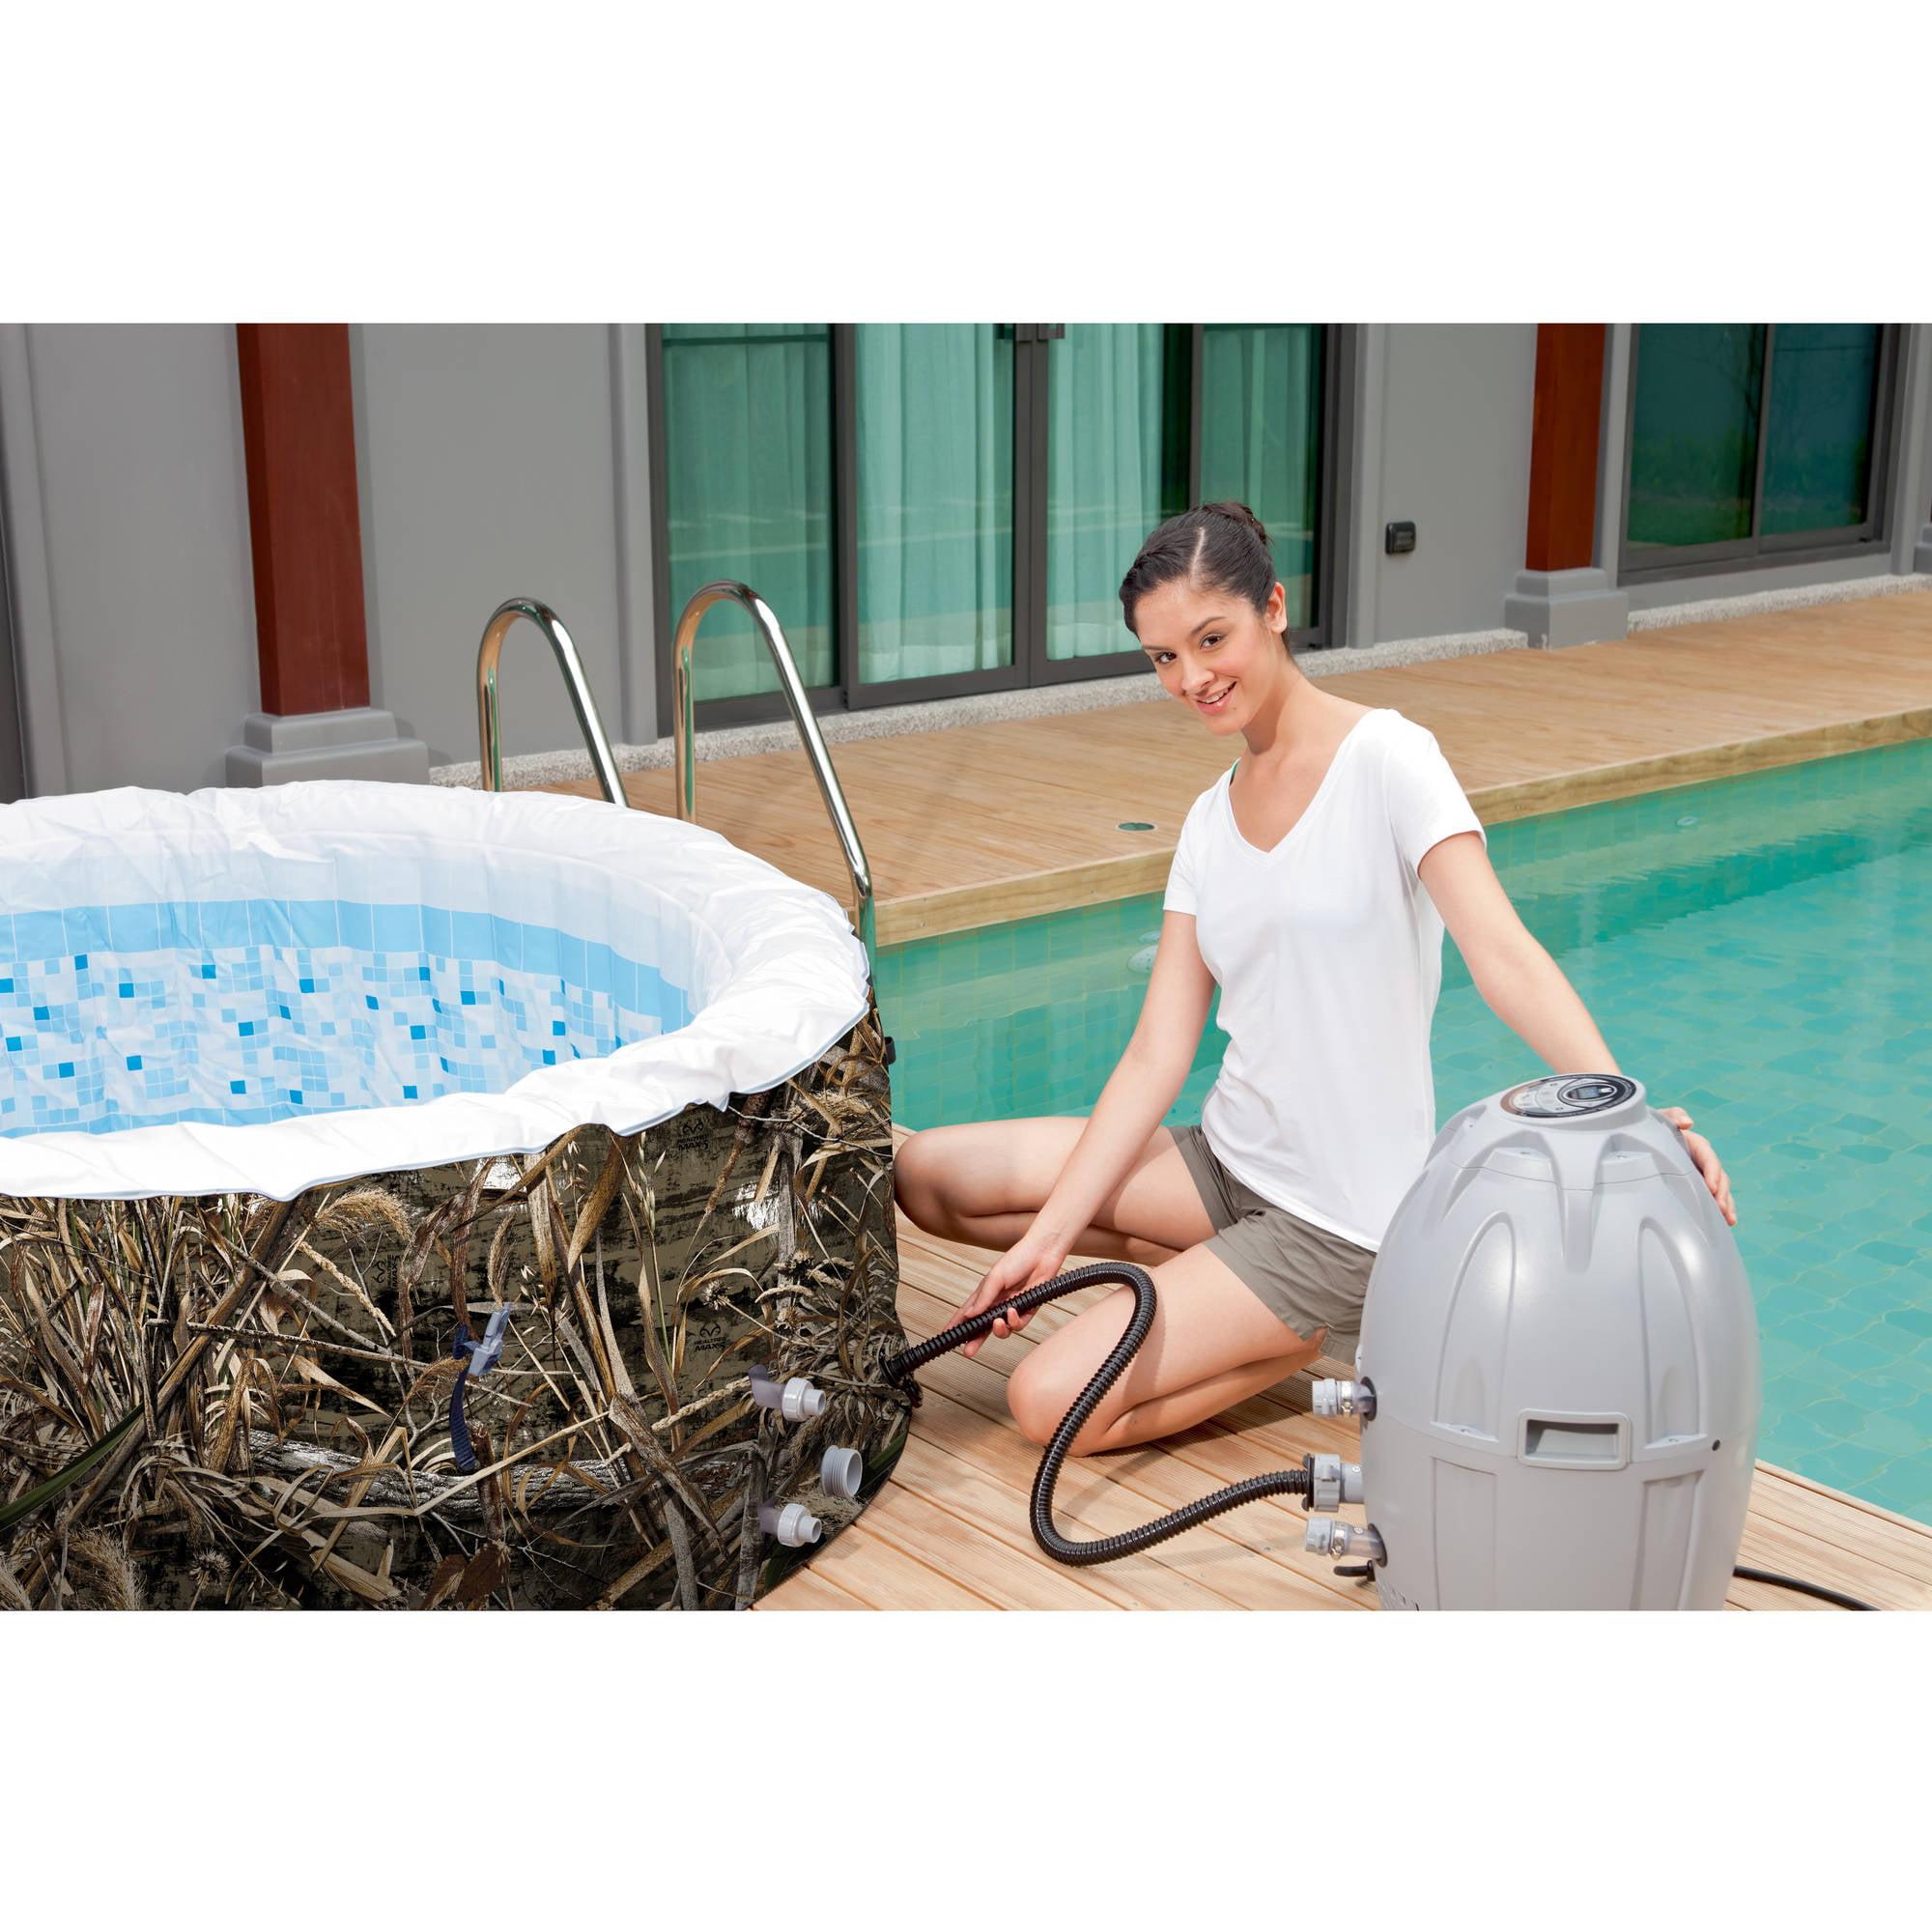 Saluspa Realtree Max 5 Airjet 4 Person Portable Inflatable Hot Tub Spa